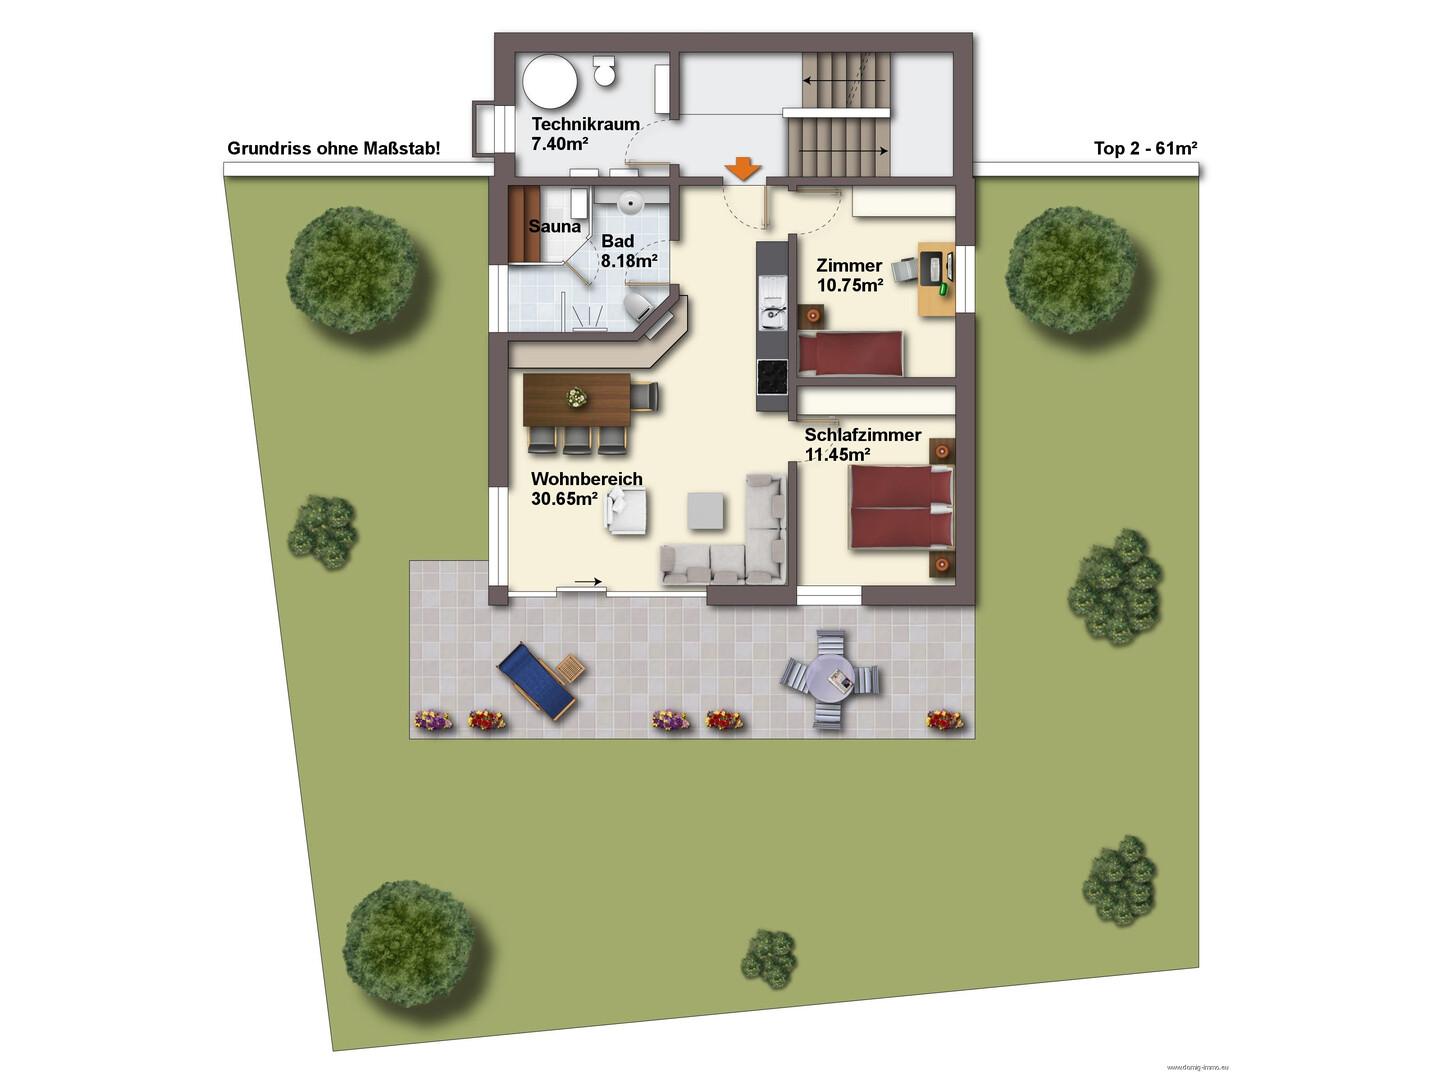 ferienwohnung kauf 75 m 4 zimmer 6707 b rserberg ort obj nr 870. Black Bedroom Furniture Sets. Home Design Ideas